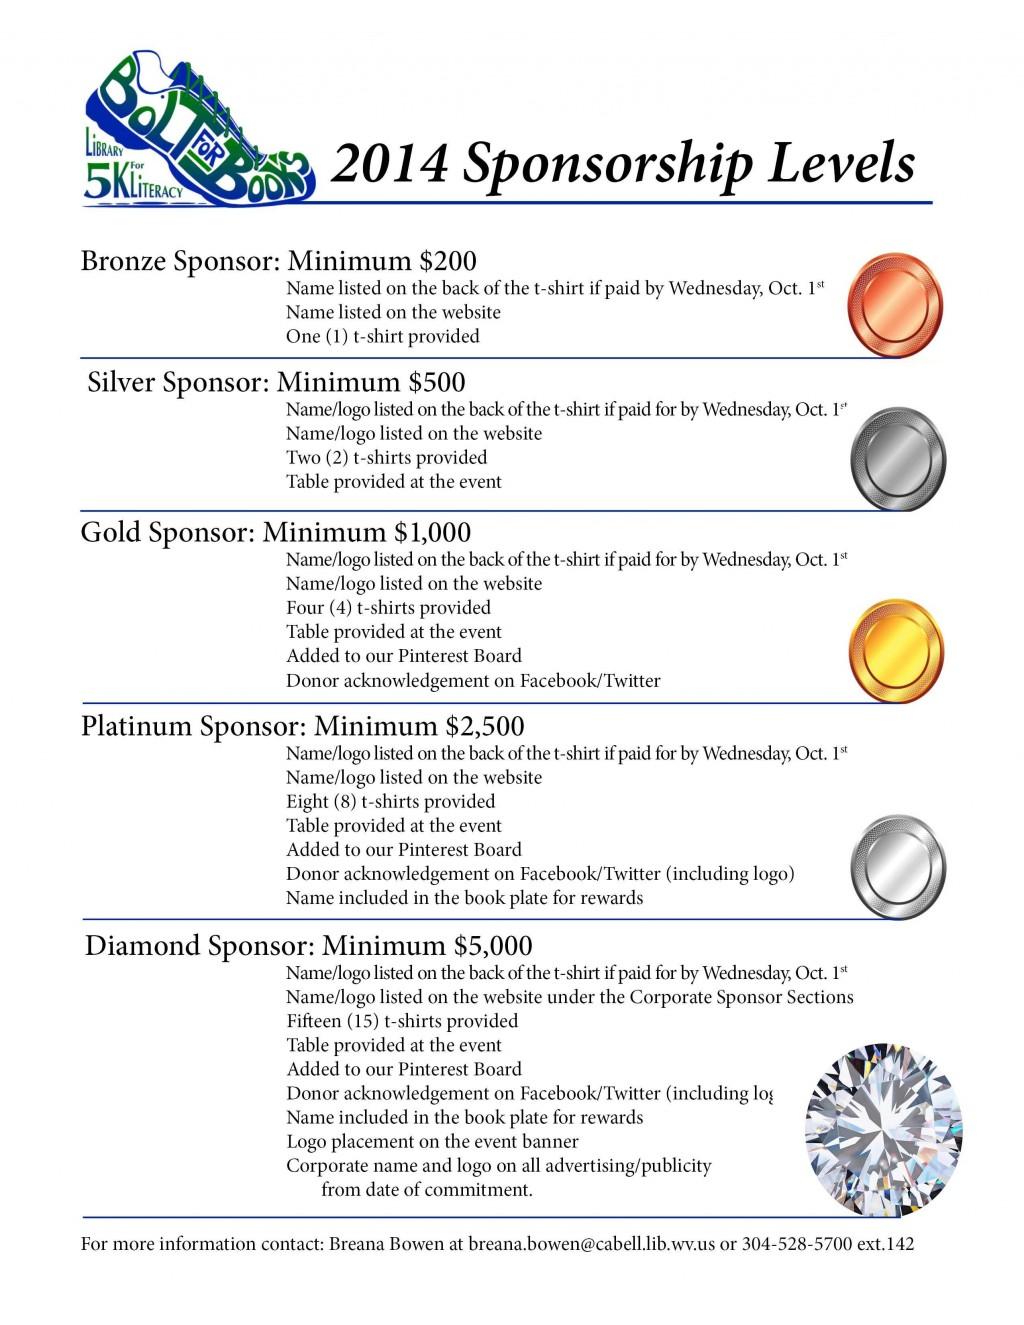 003 Top Event Sponsorship Form Template High Definition  Sponsor RequestLarge